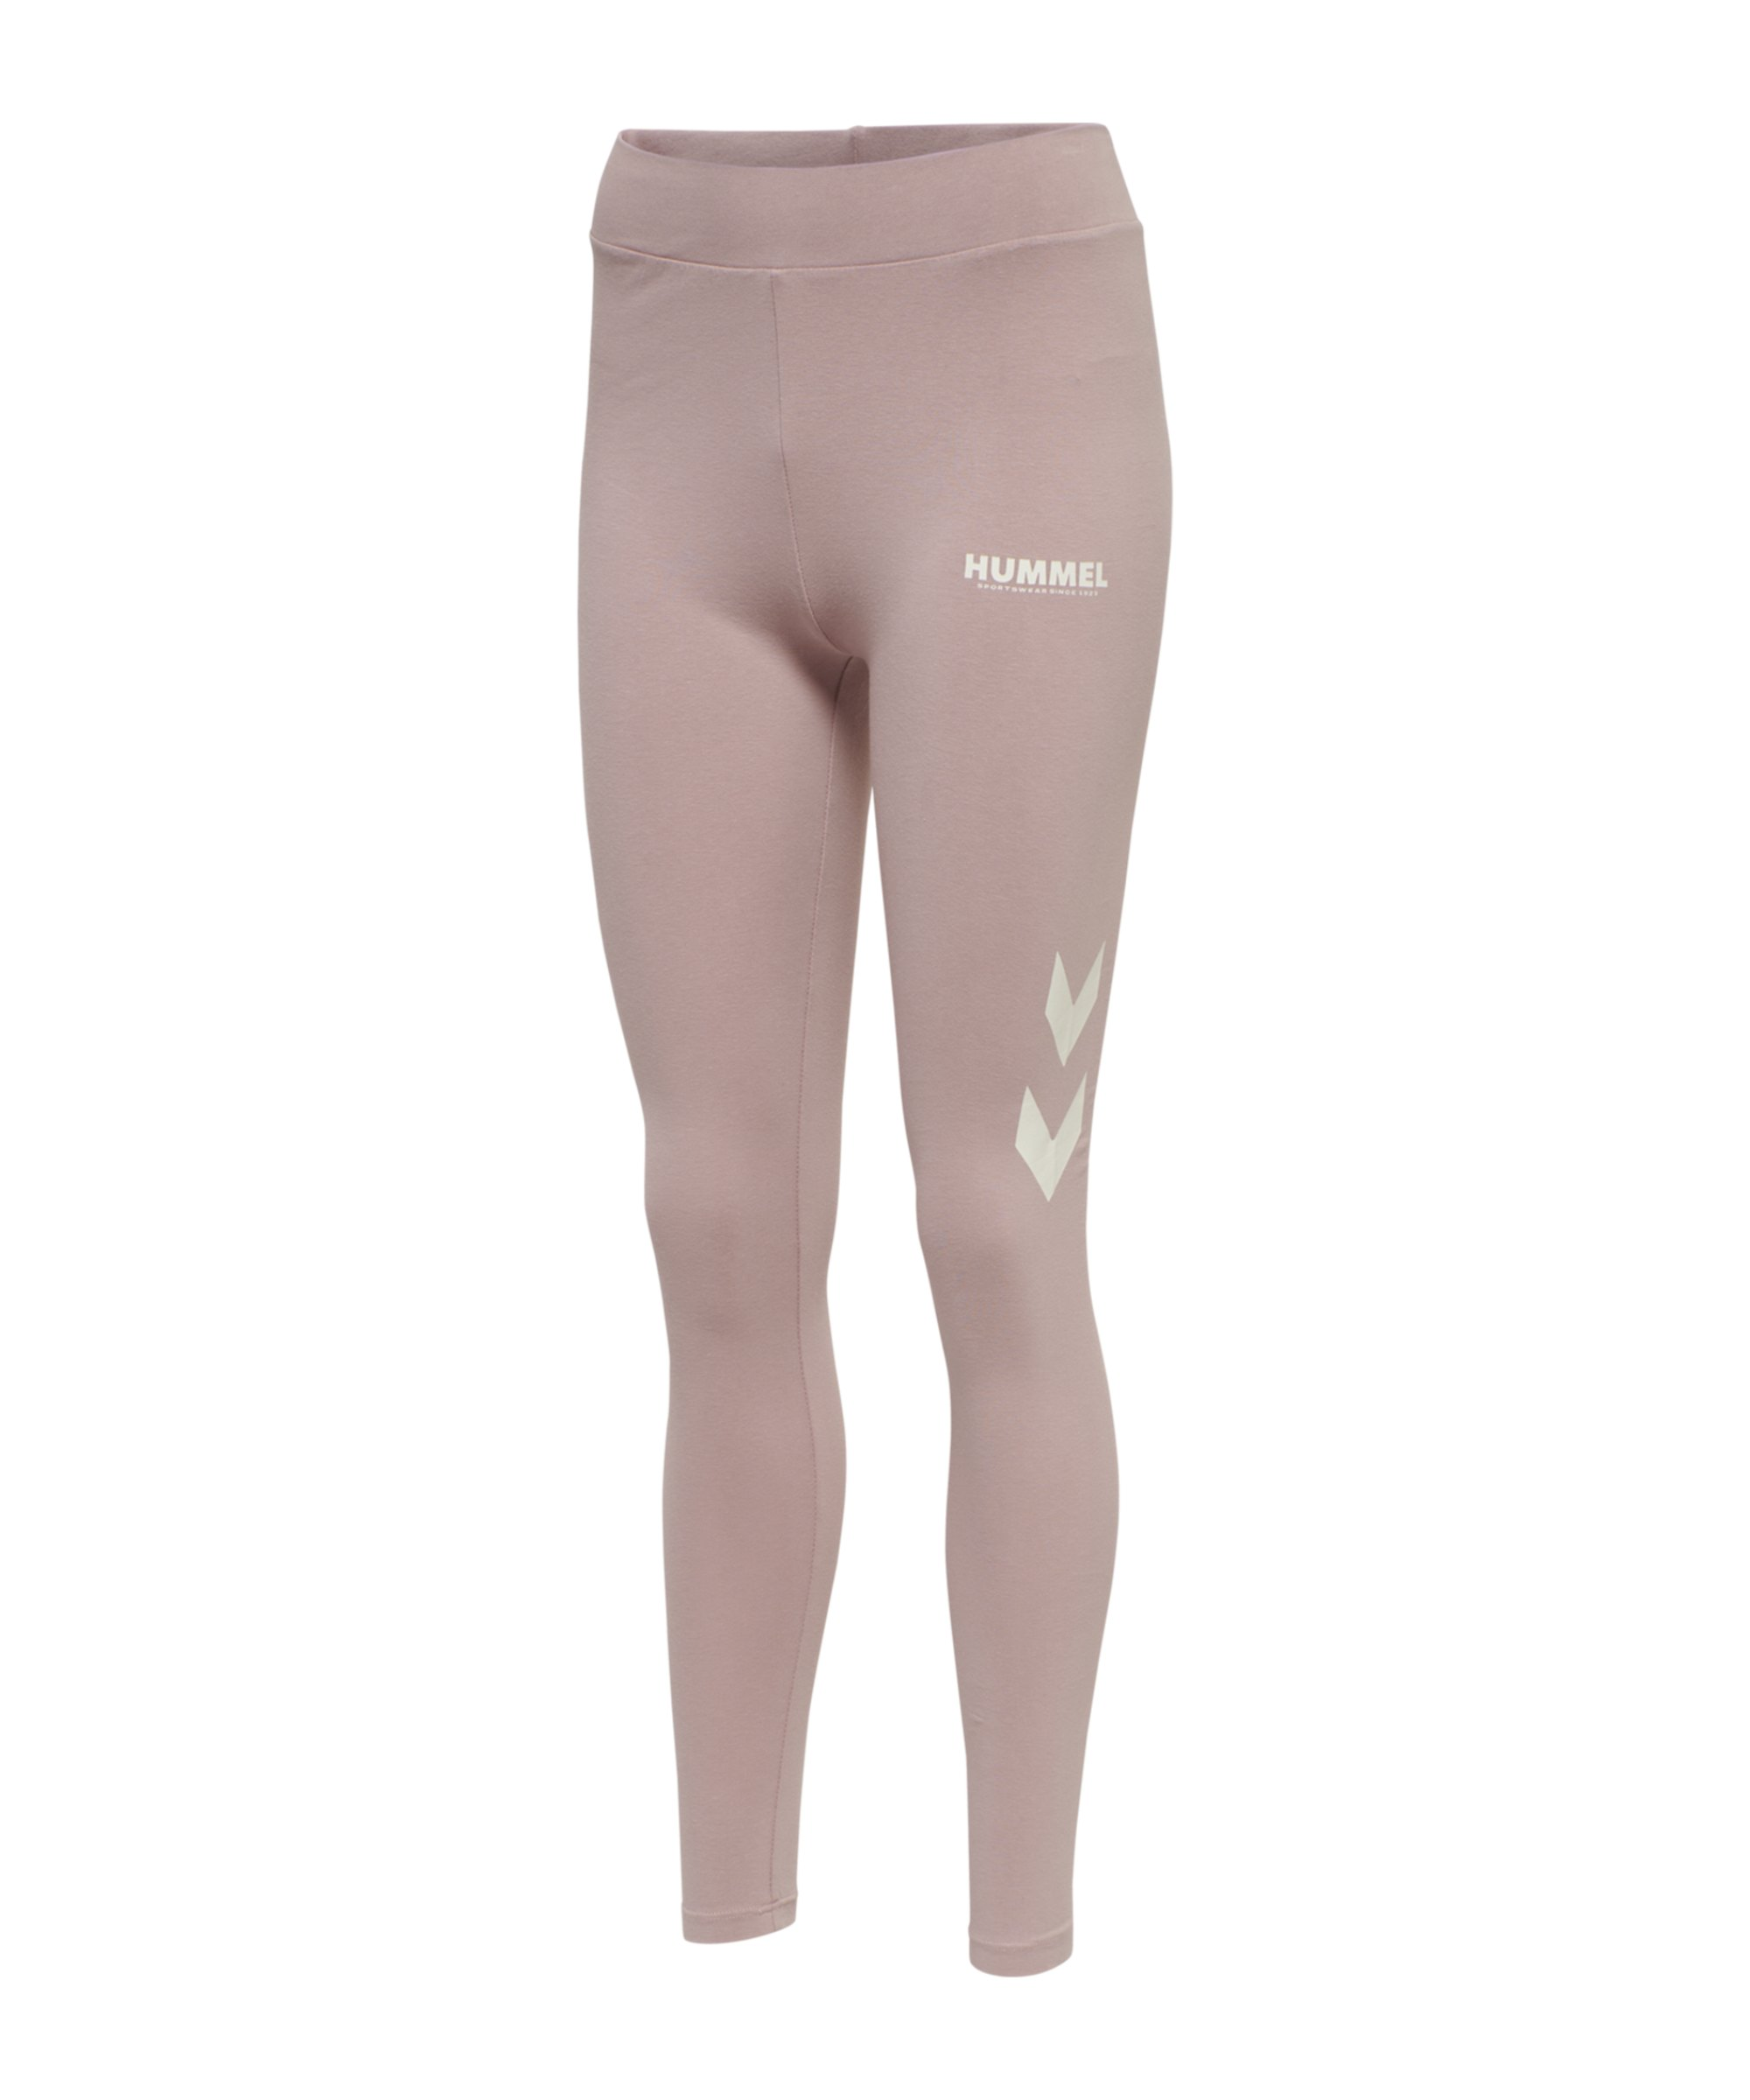 Hummel Legacy High Waist Leggings Damen F4852 - rosa